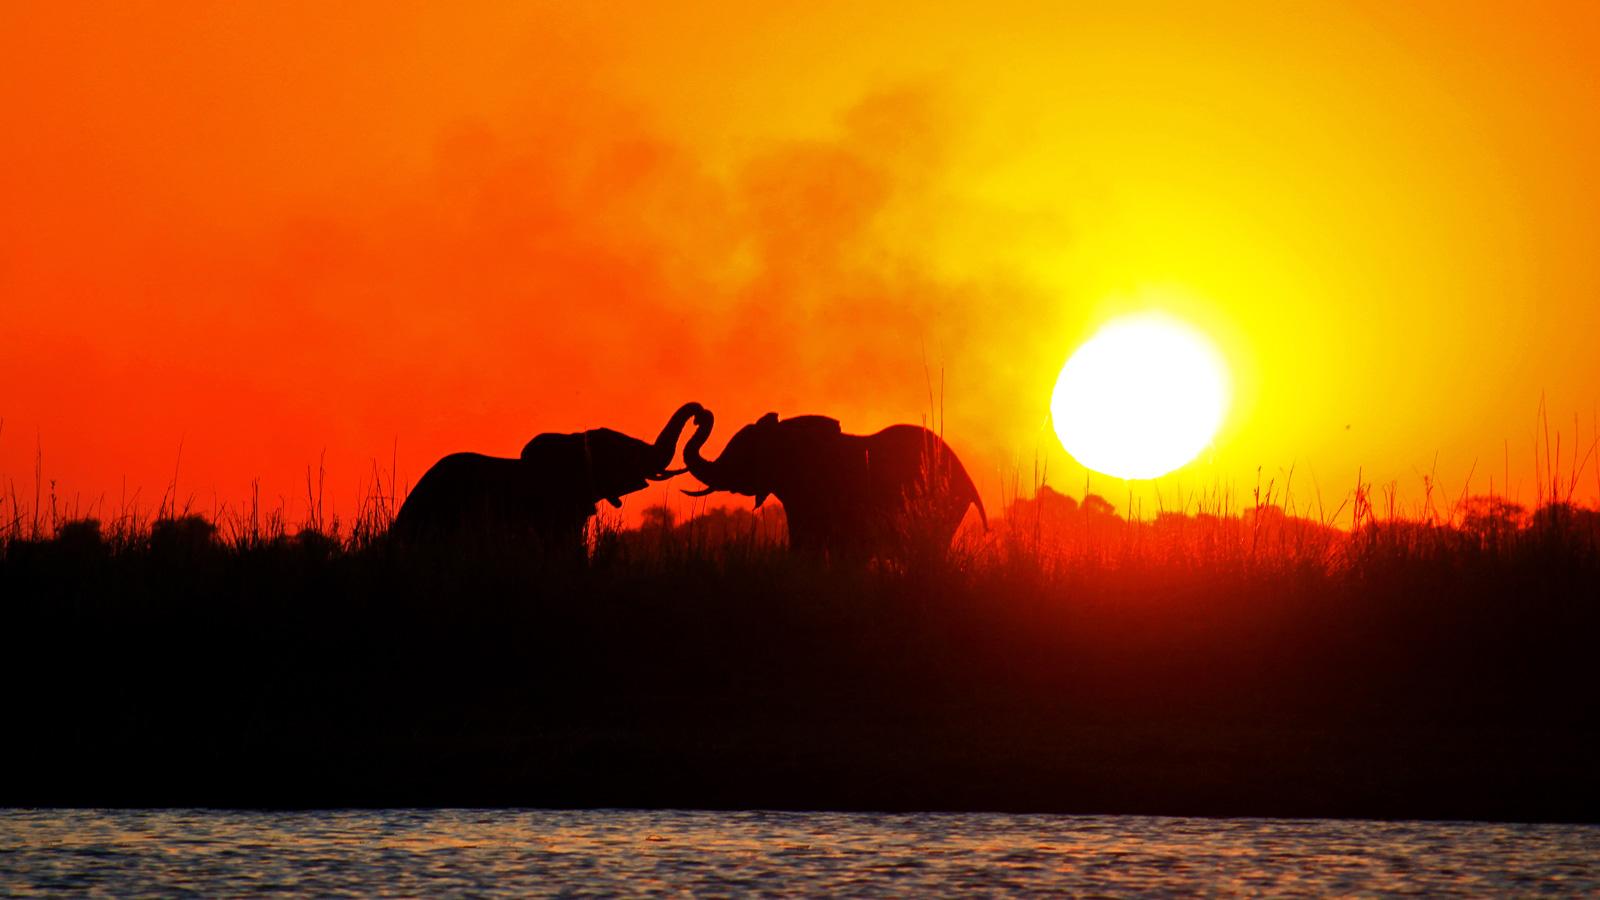 Elefanten im Chobe Nationalpark Botswana Erlebnisreise traveljunkies